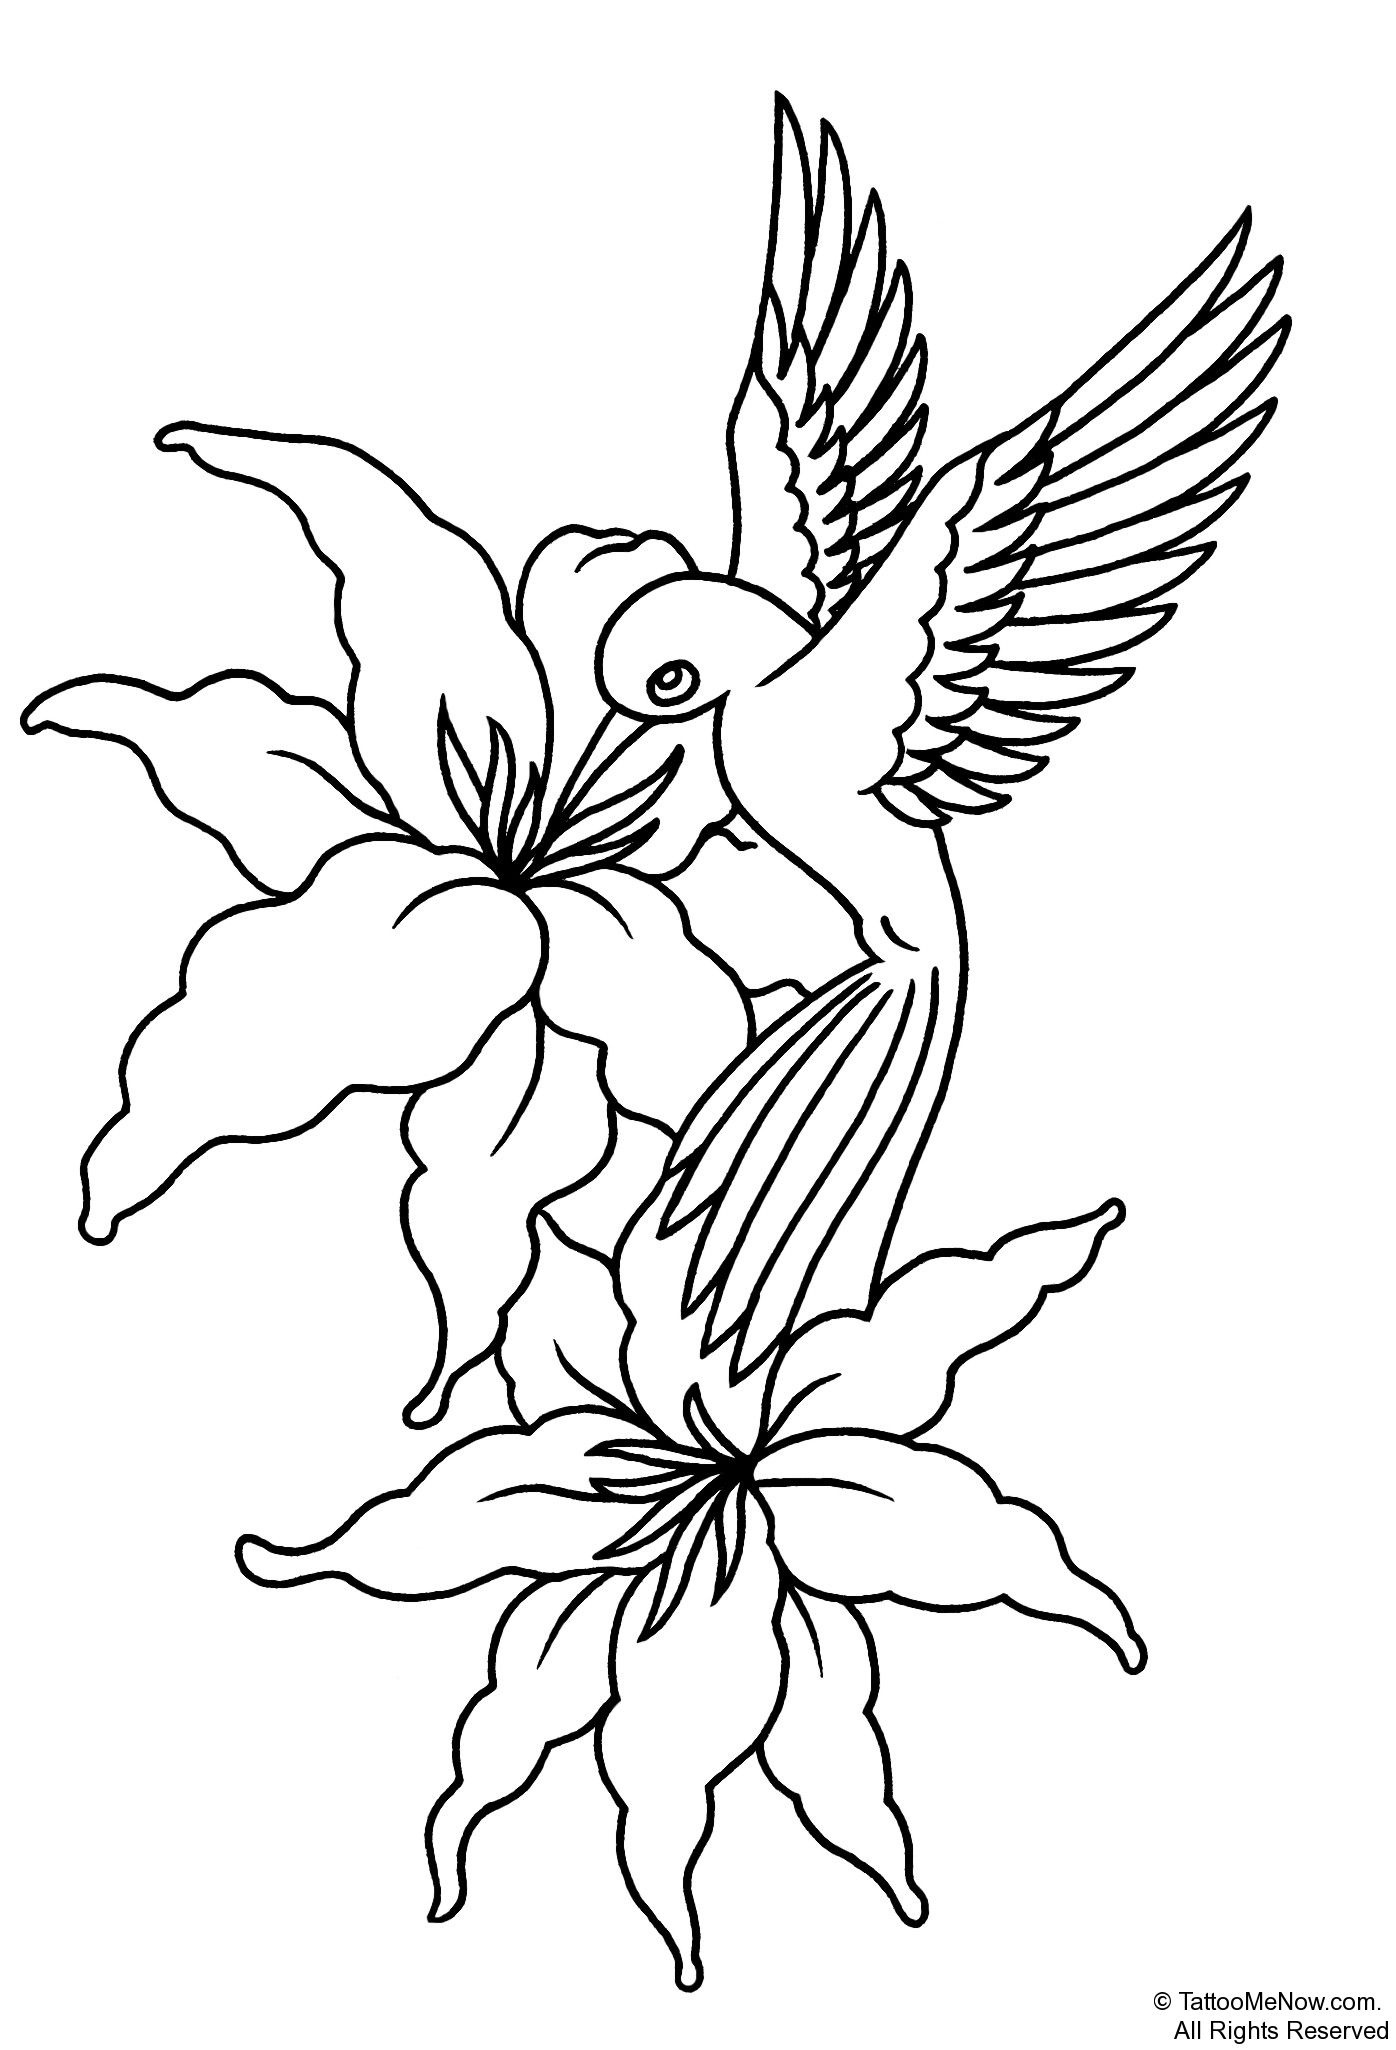 Free Printable Tattoo Stencils | Your Free Tattoo Designs & Stencils - Free Printable Tattoo Flash